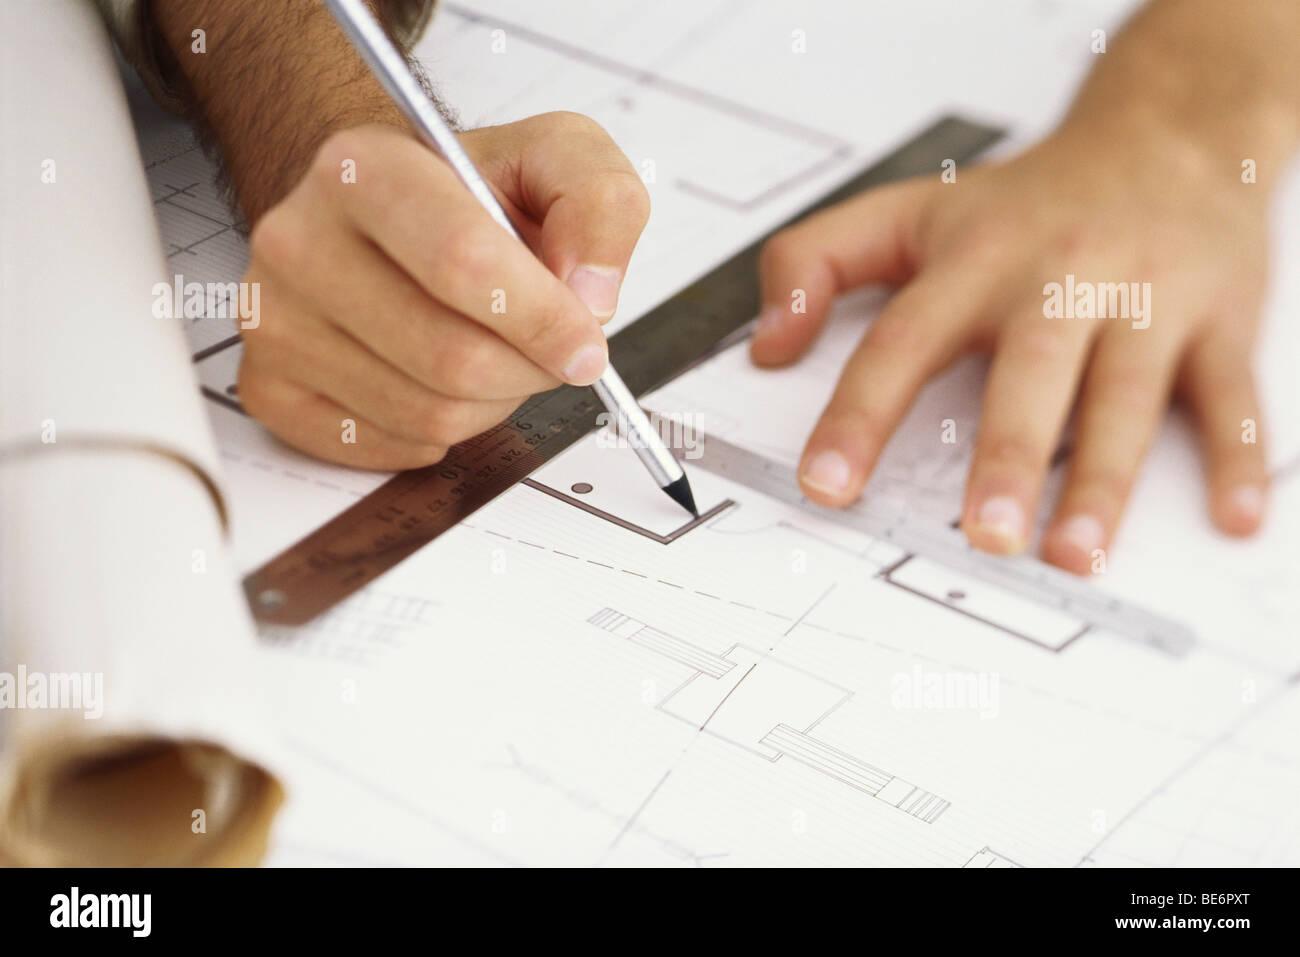 Architect editing blueprint, close-up - Stock Image